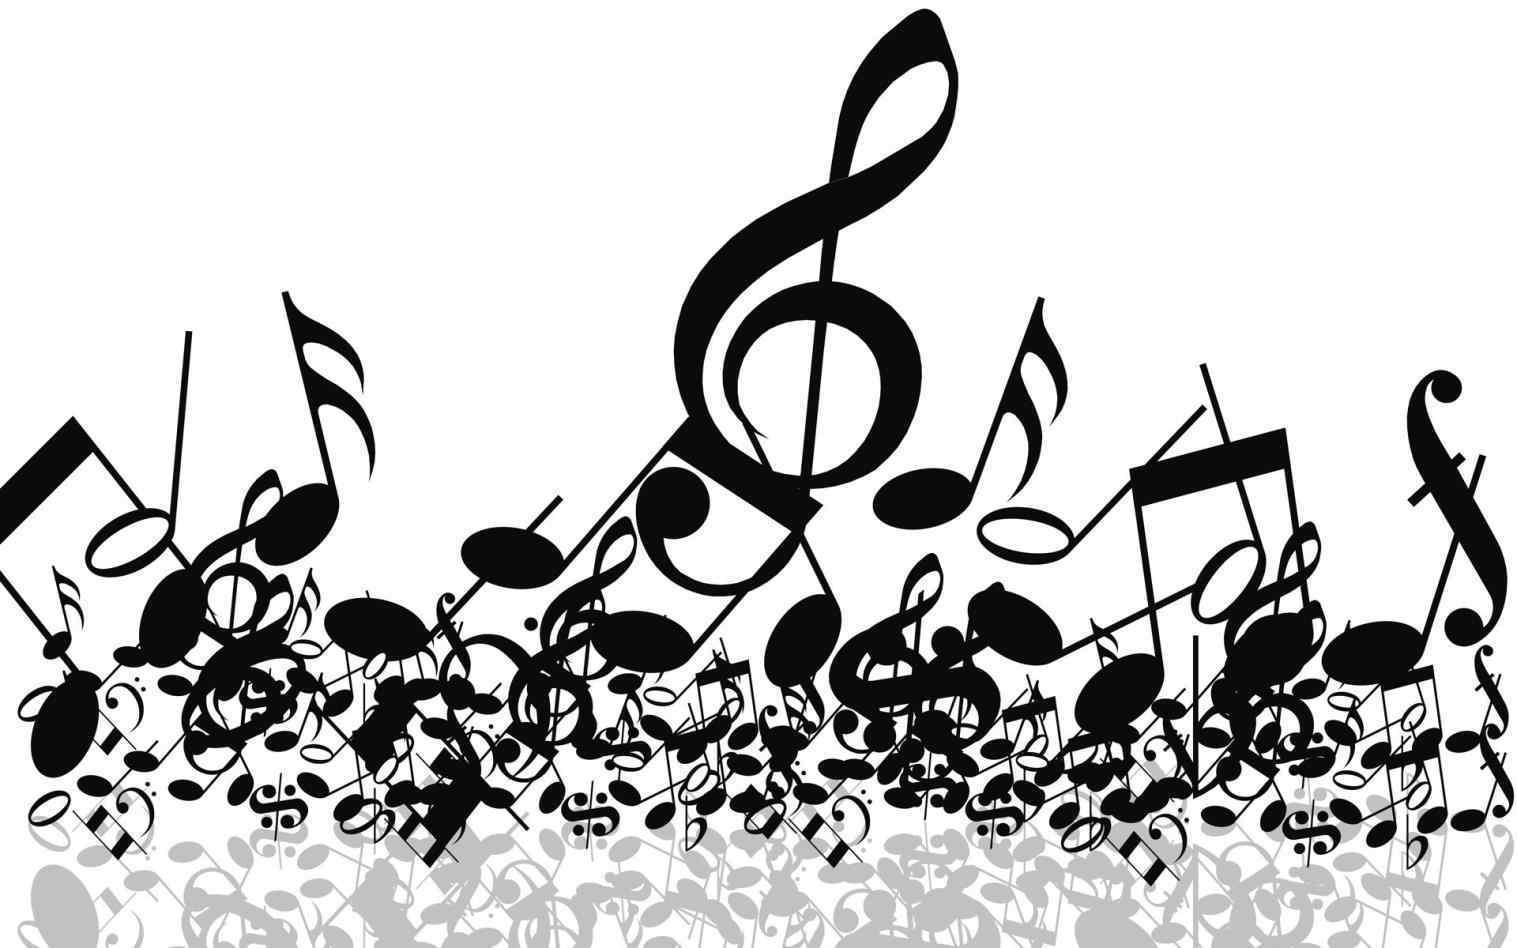 1517x948 Clip Art Al Music Note Drawings Tumblr S Artwork Free Download